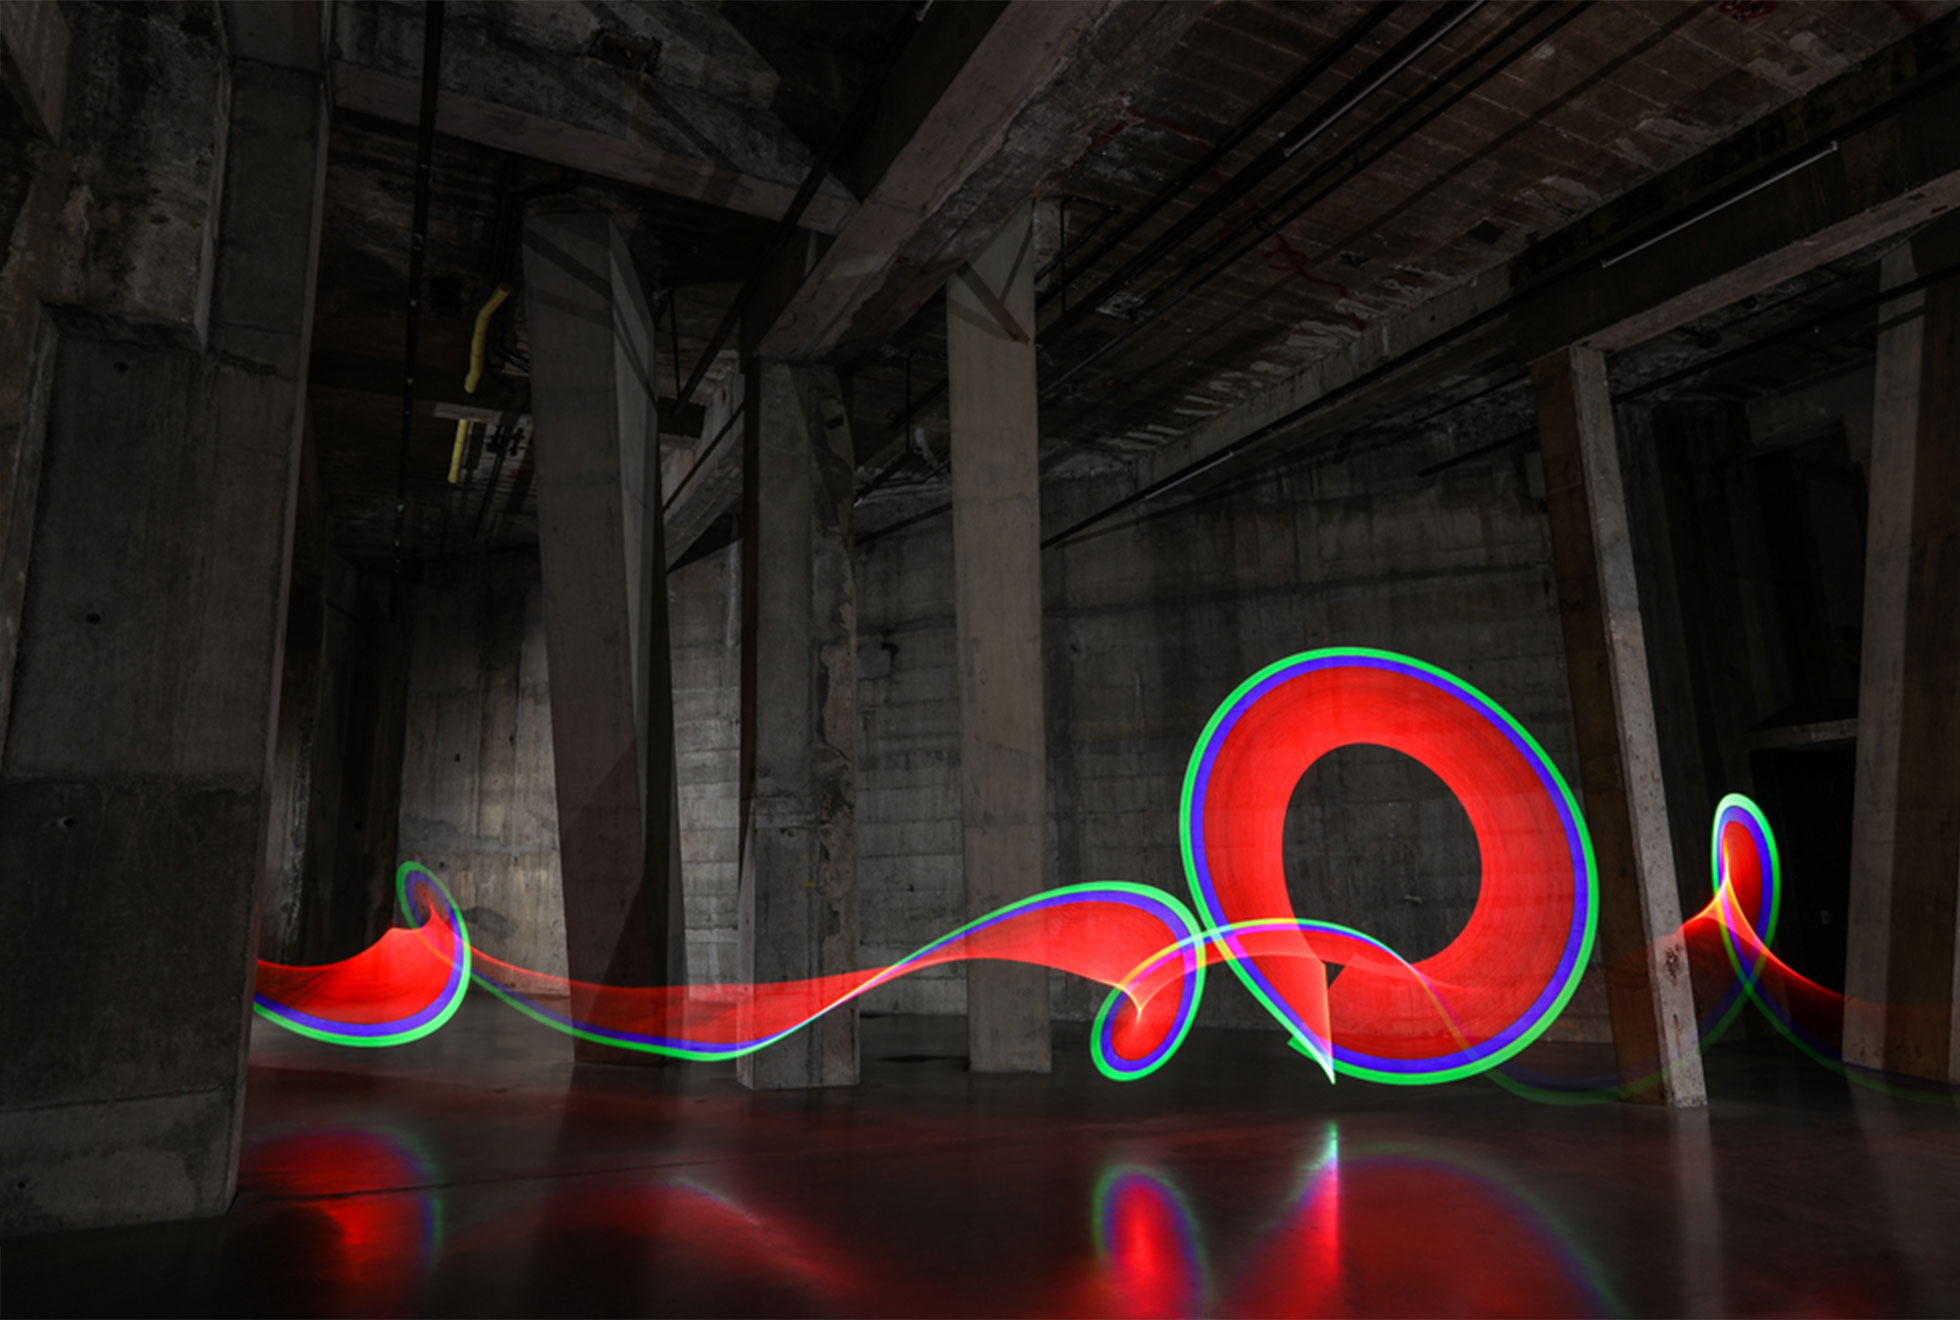 Lenovo-Light-Painting-Backgrounds-by-Sola-Lightbombing-Tate-Modern-2